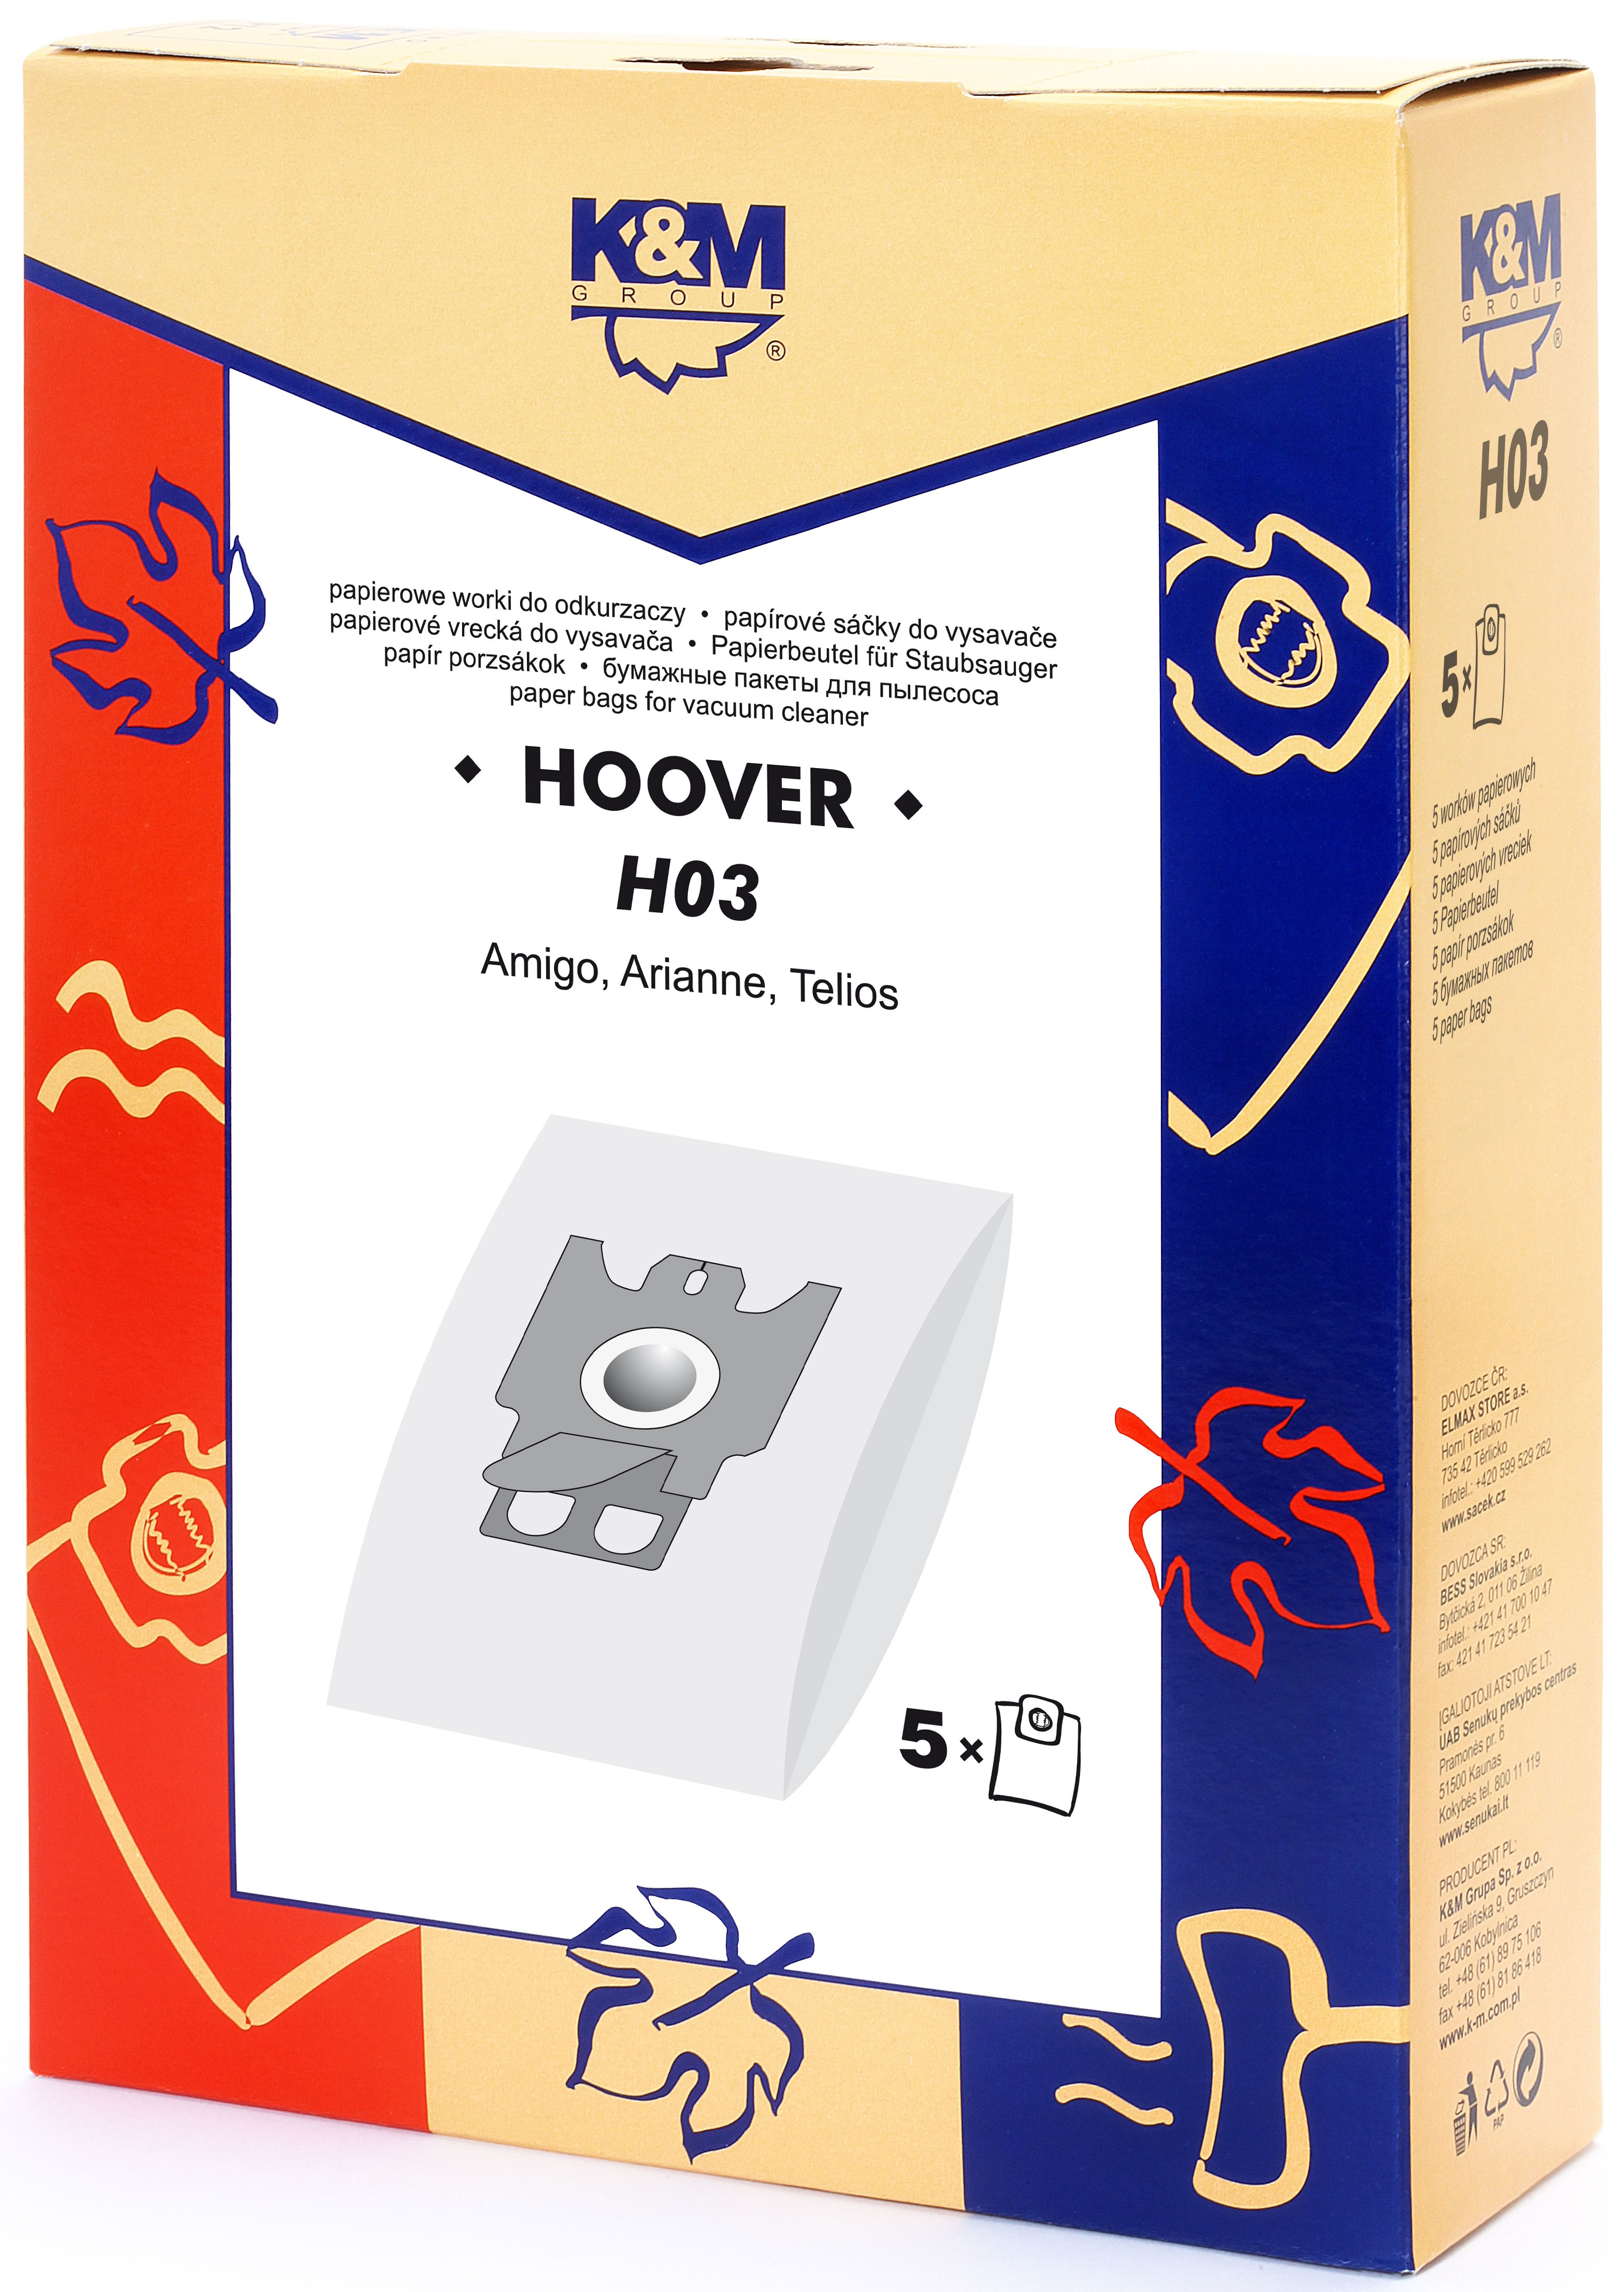 Sac aspirator Hoover H30, hartie, 5X saci, K&M [0]